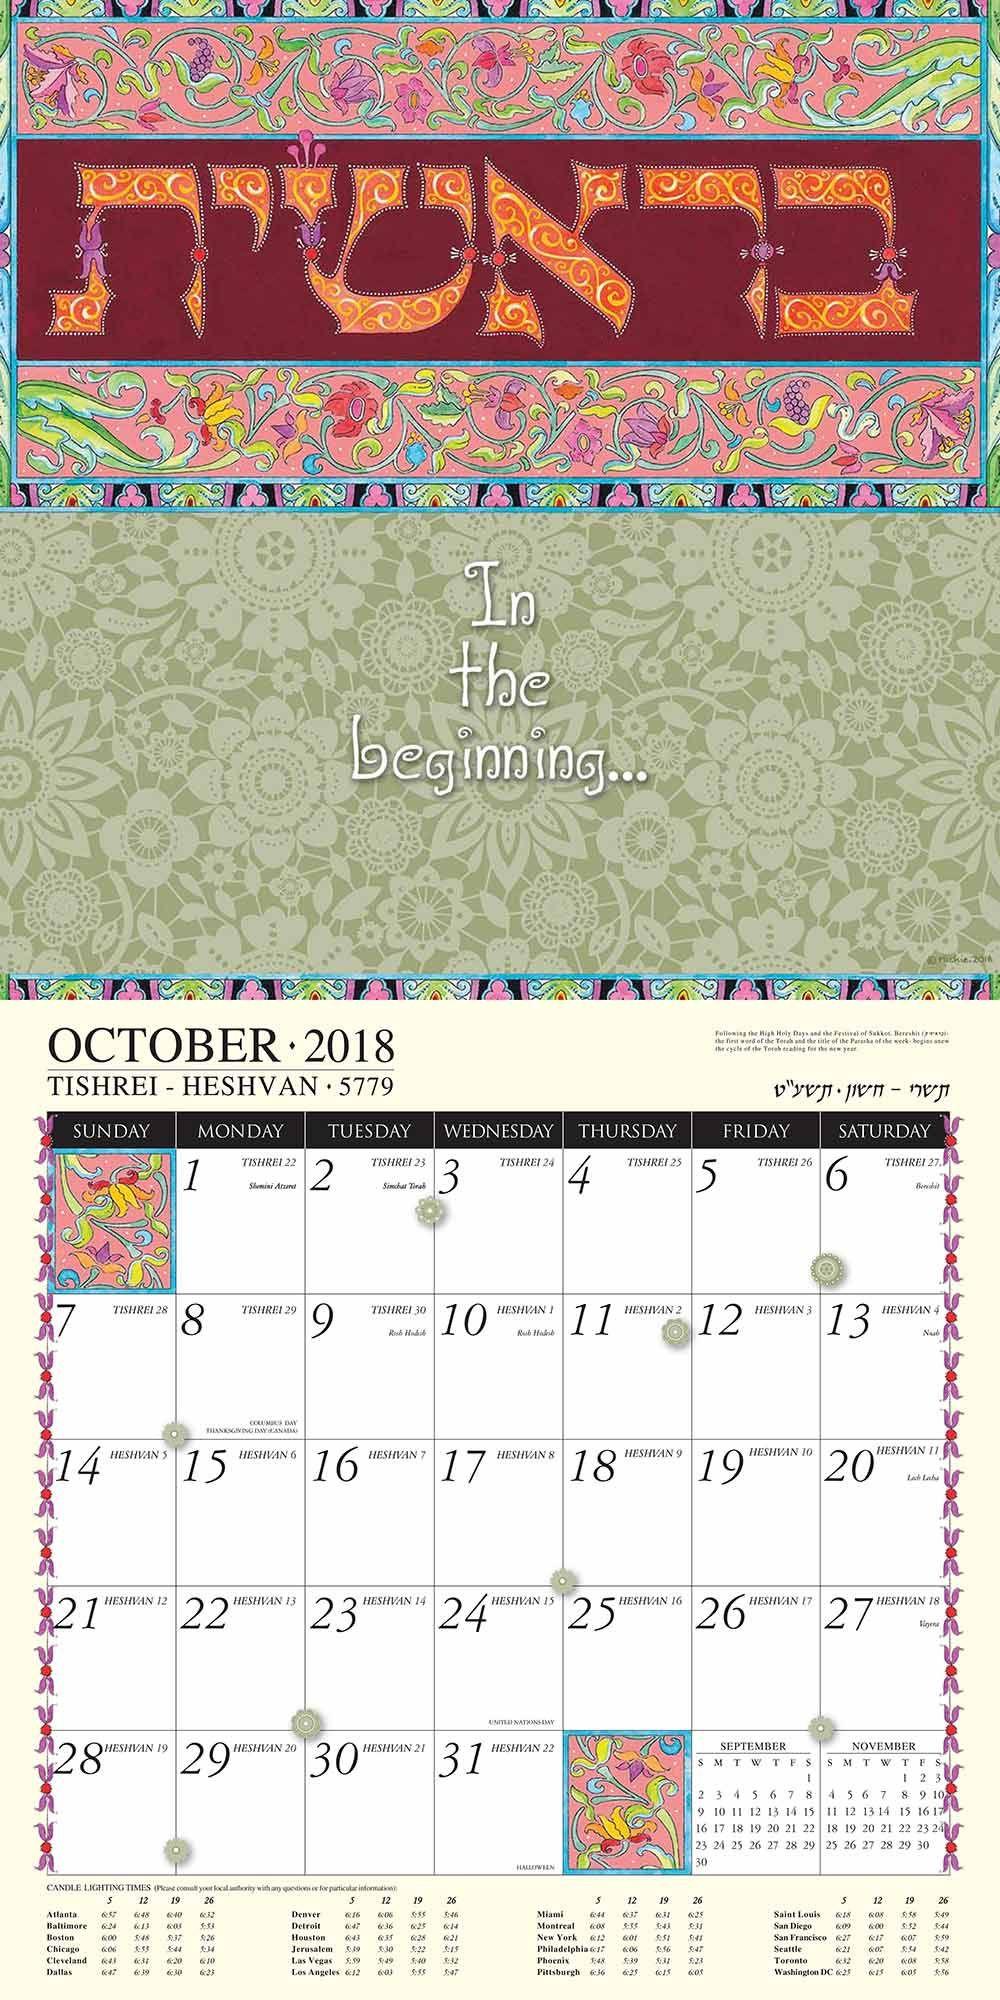 20+ Hebrew English Calendar 2021 - Free Download Printable-Printable Hebrew Calendar 2021